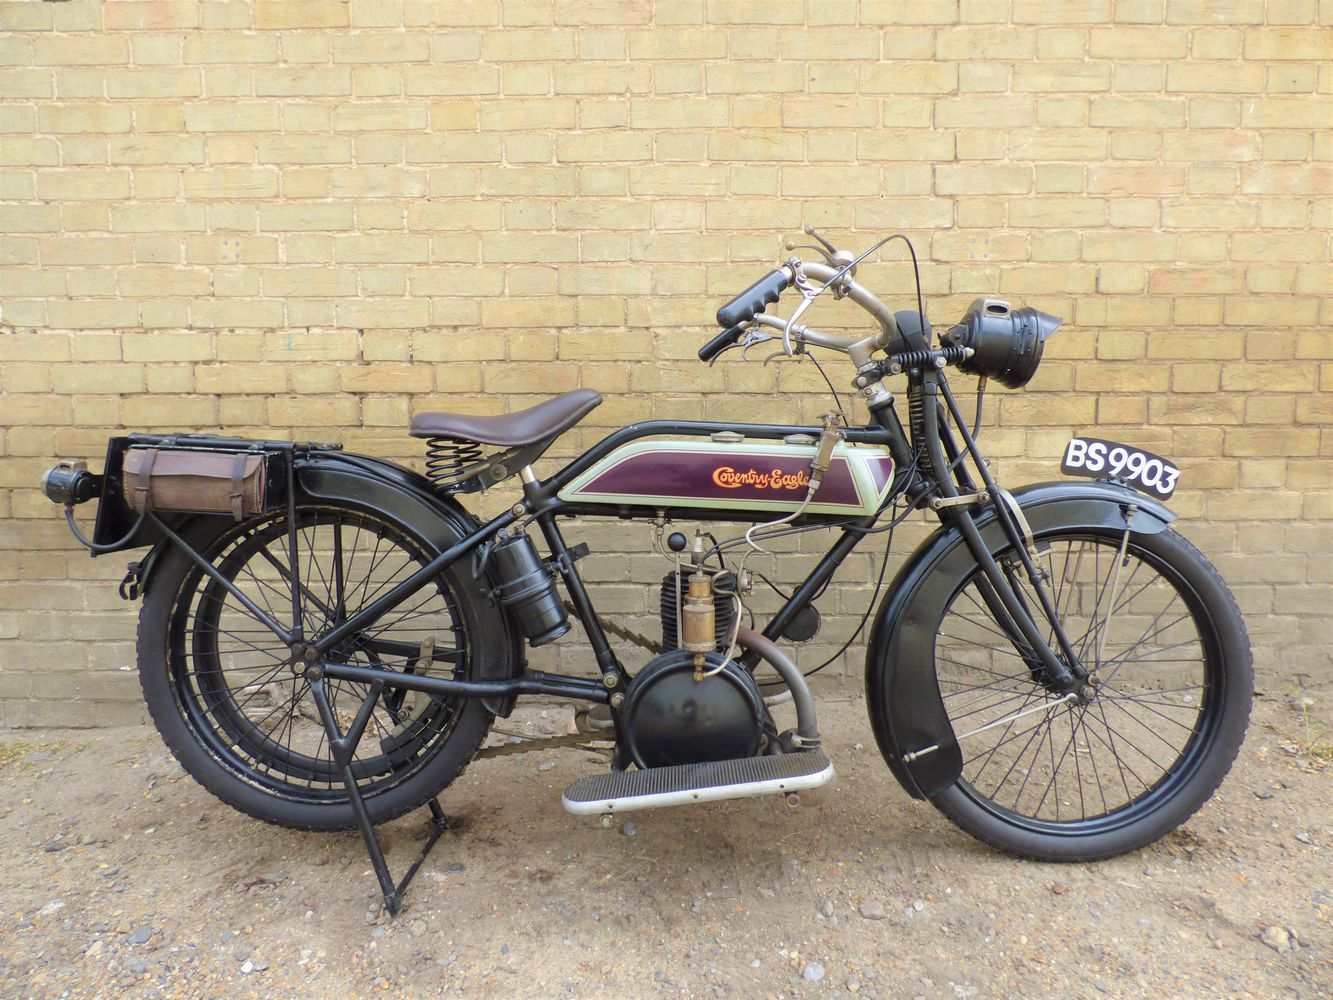 For sale 1957 200cc Ariel LH Colt Suffolk classic bike dealer Andy Tiernan is offering for sale this halfforgotten Ariel a rareish bike that in its day